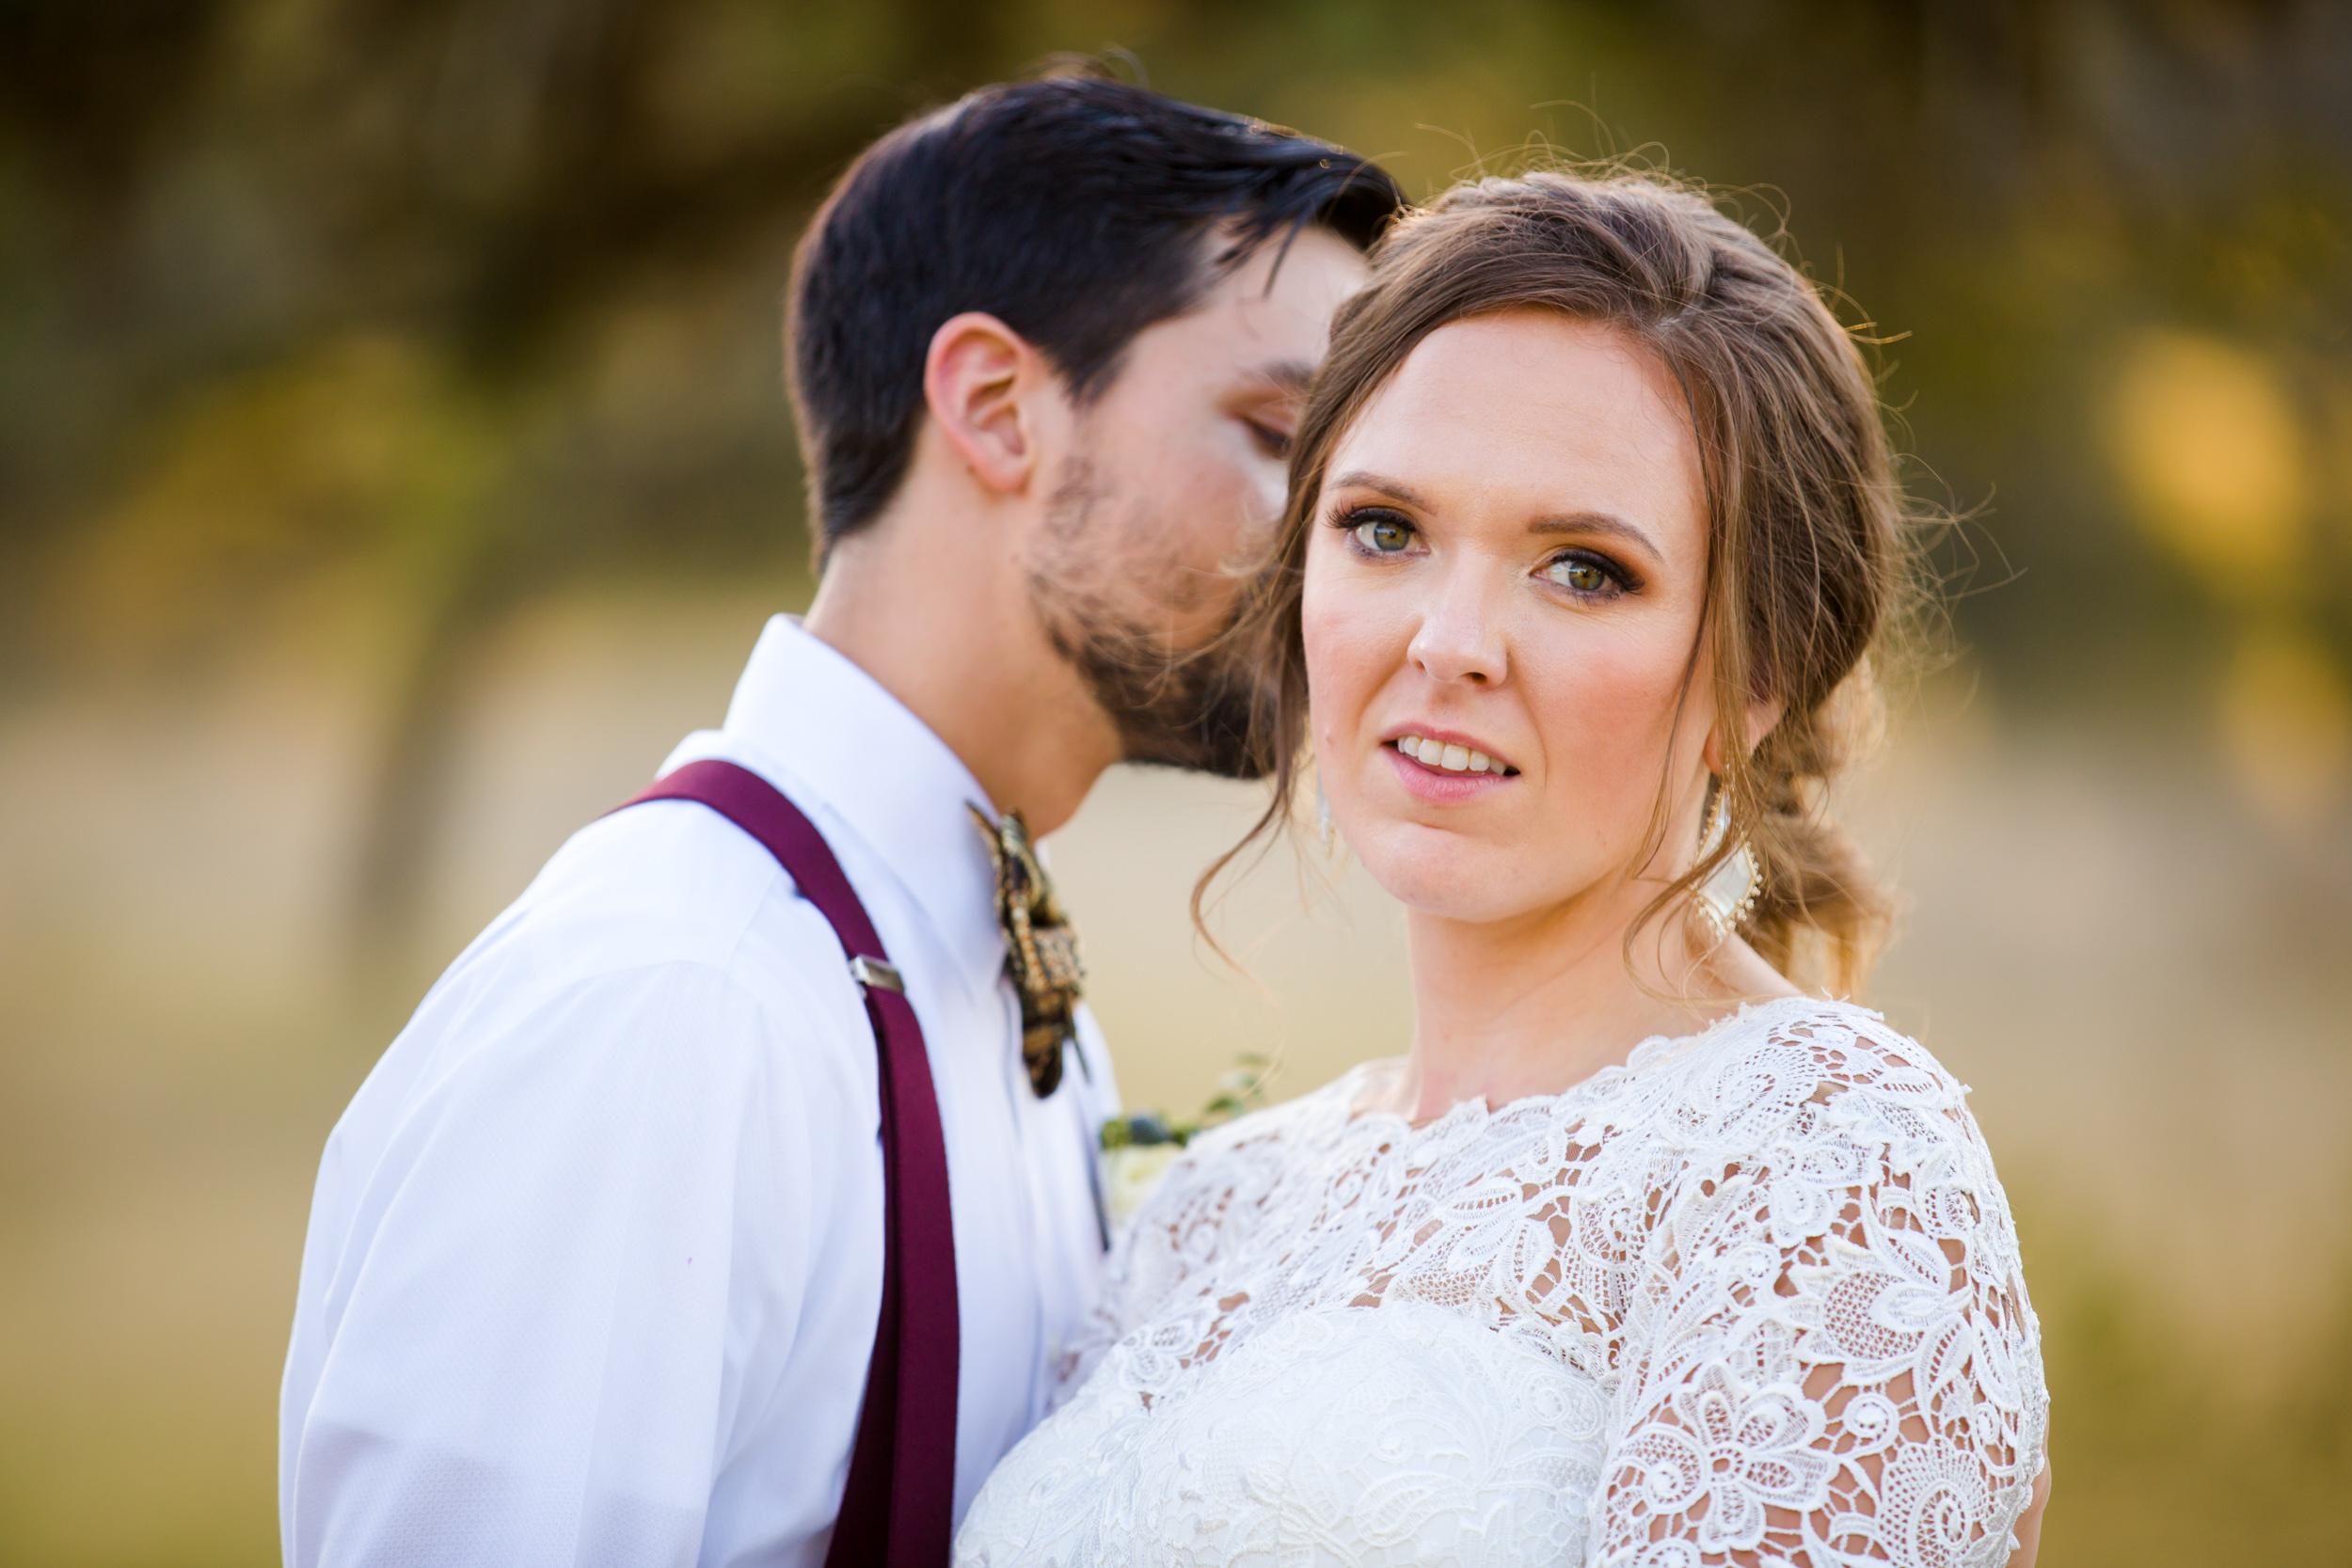 austin-wedding-colorful-43.jpg